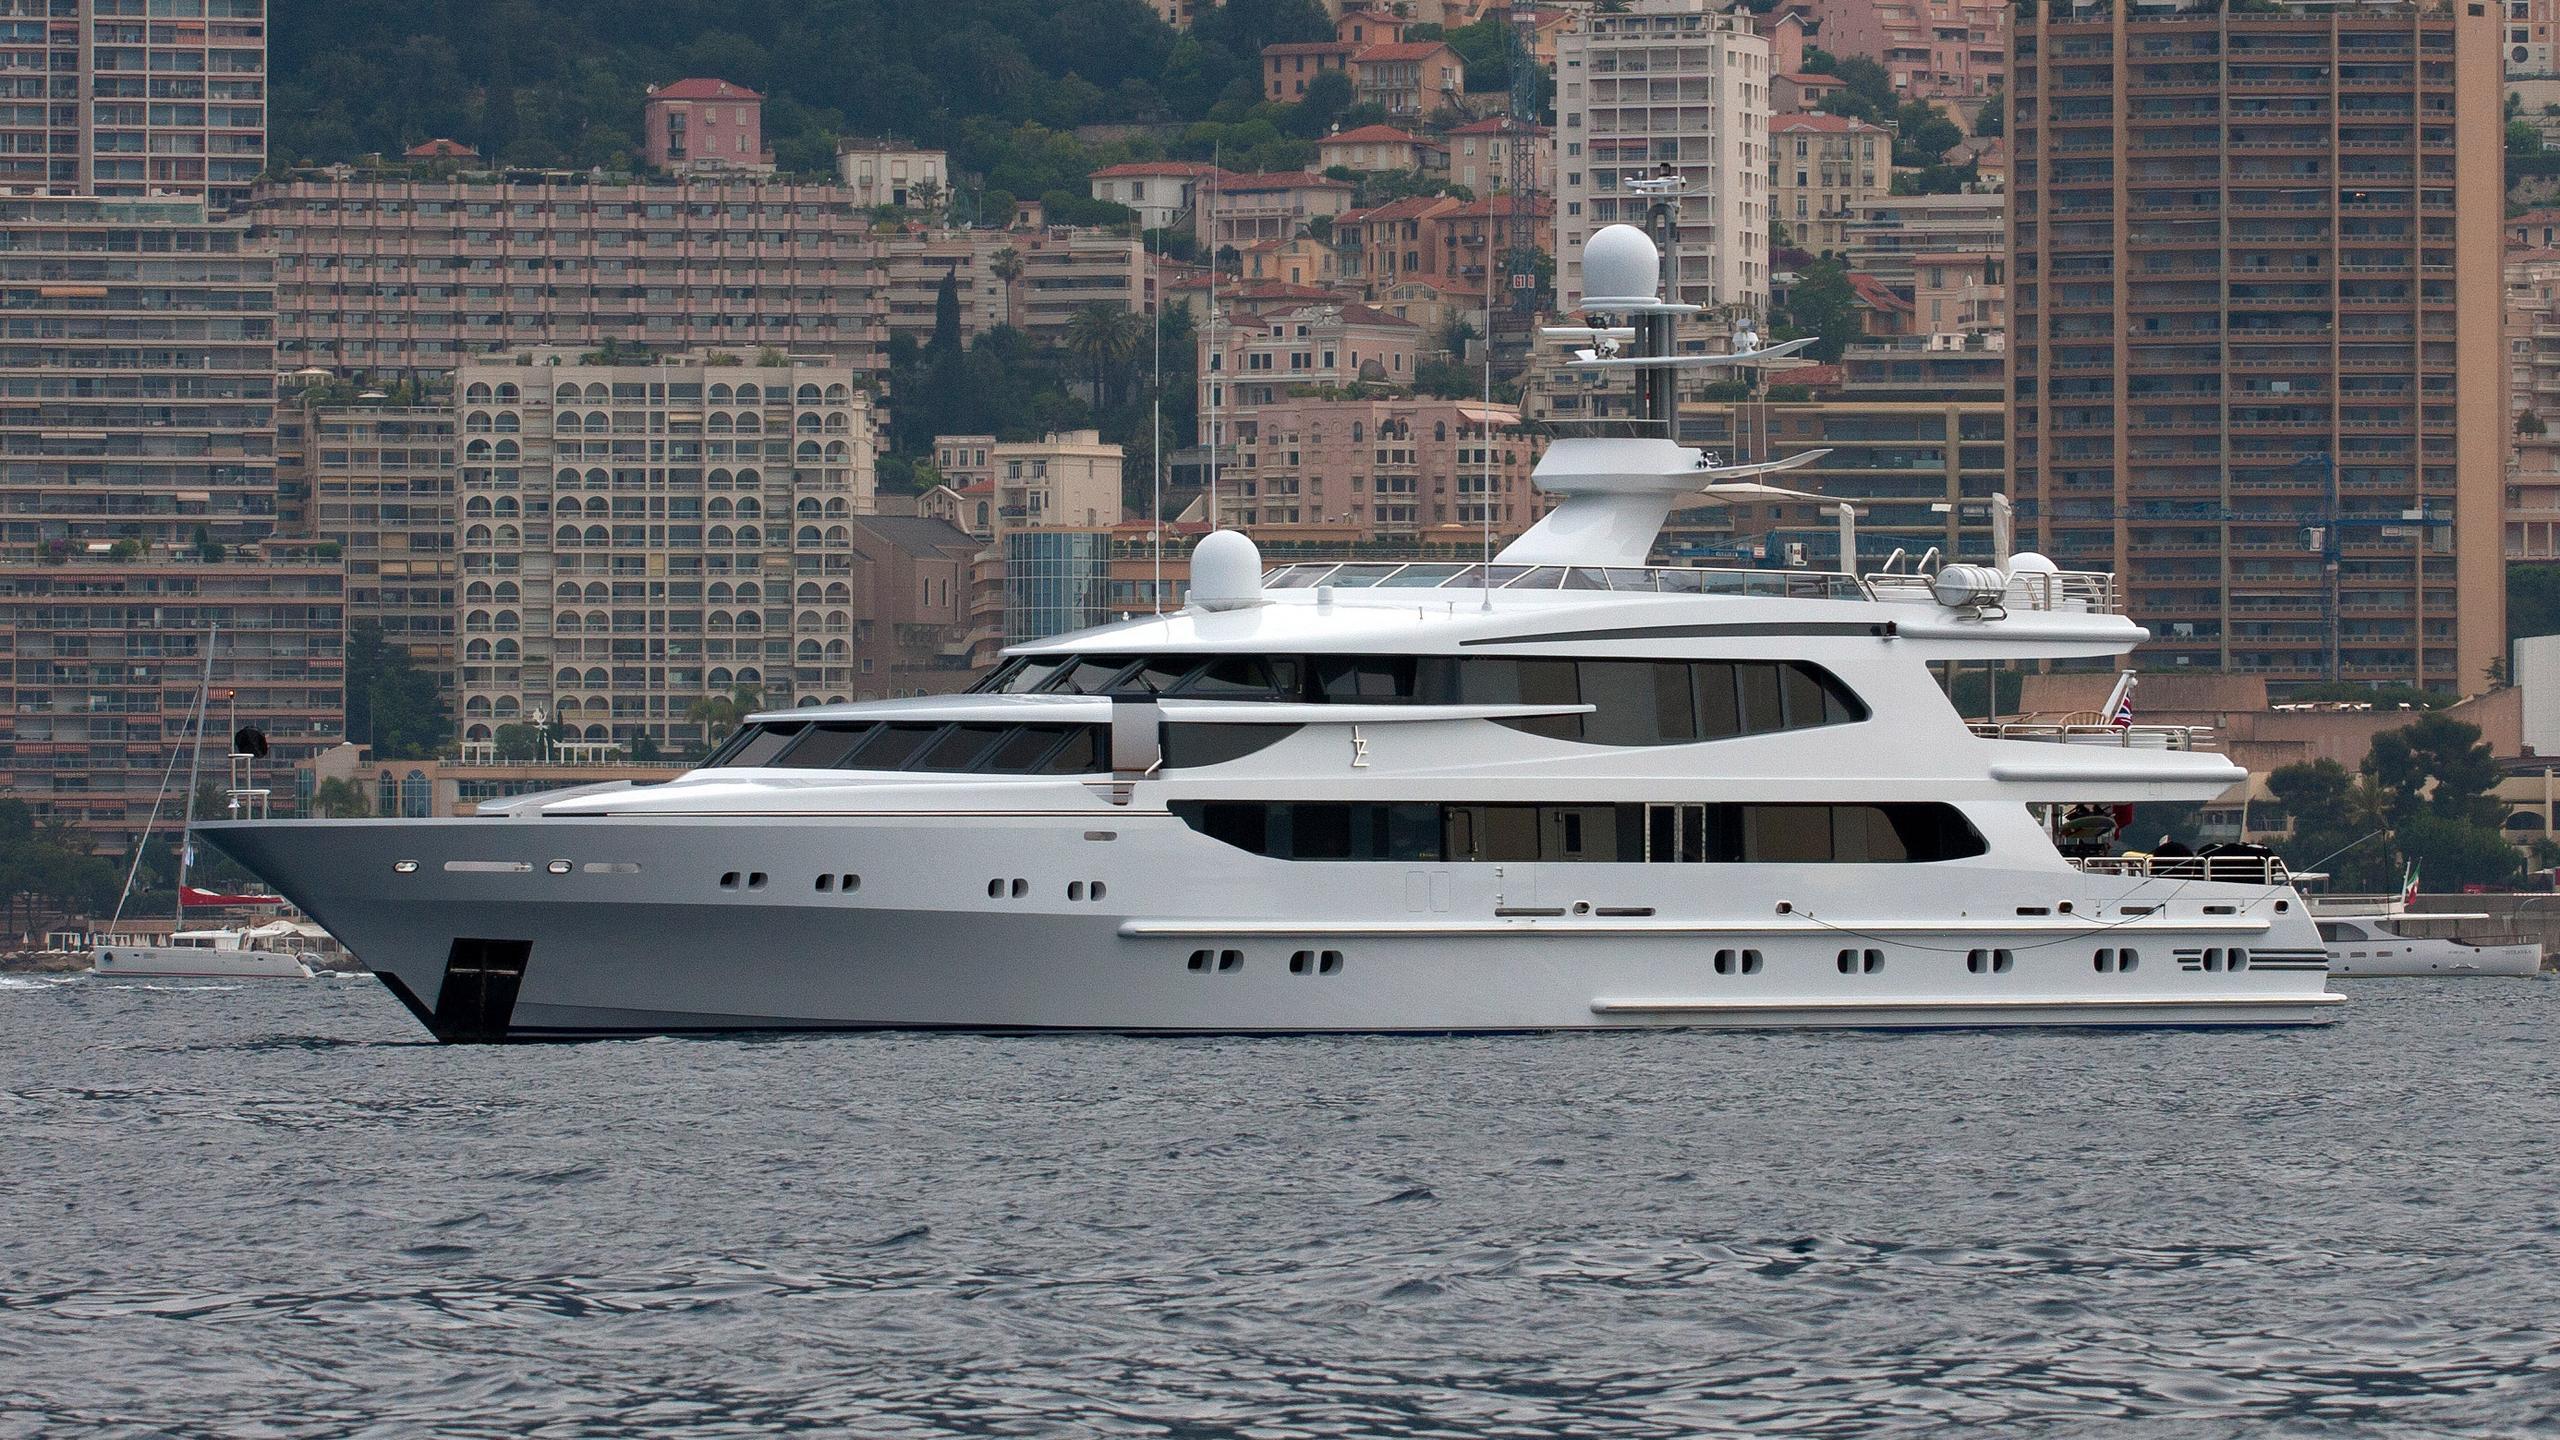 lazy-z-motor-yacht-oceanco-1997-51m-half-profile